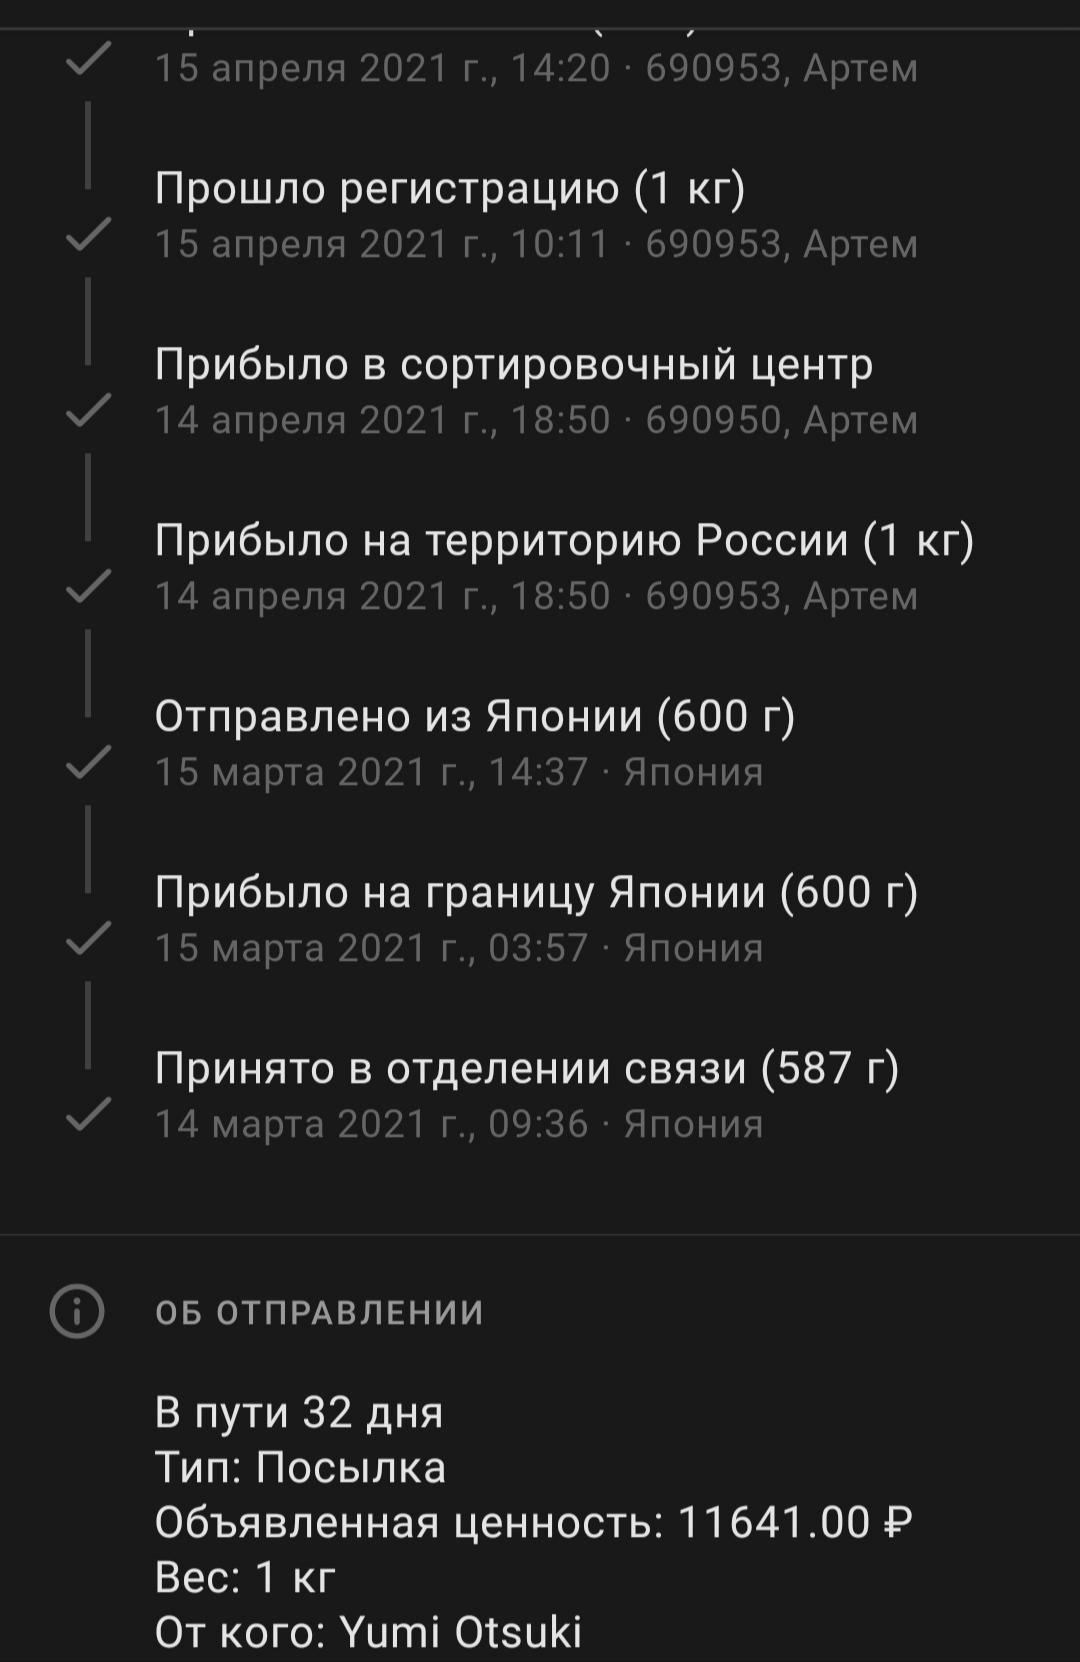 IMG_20210415_122951.jpg